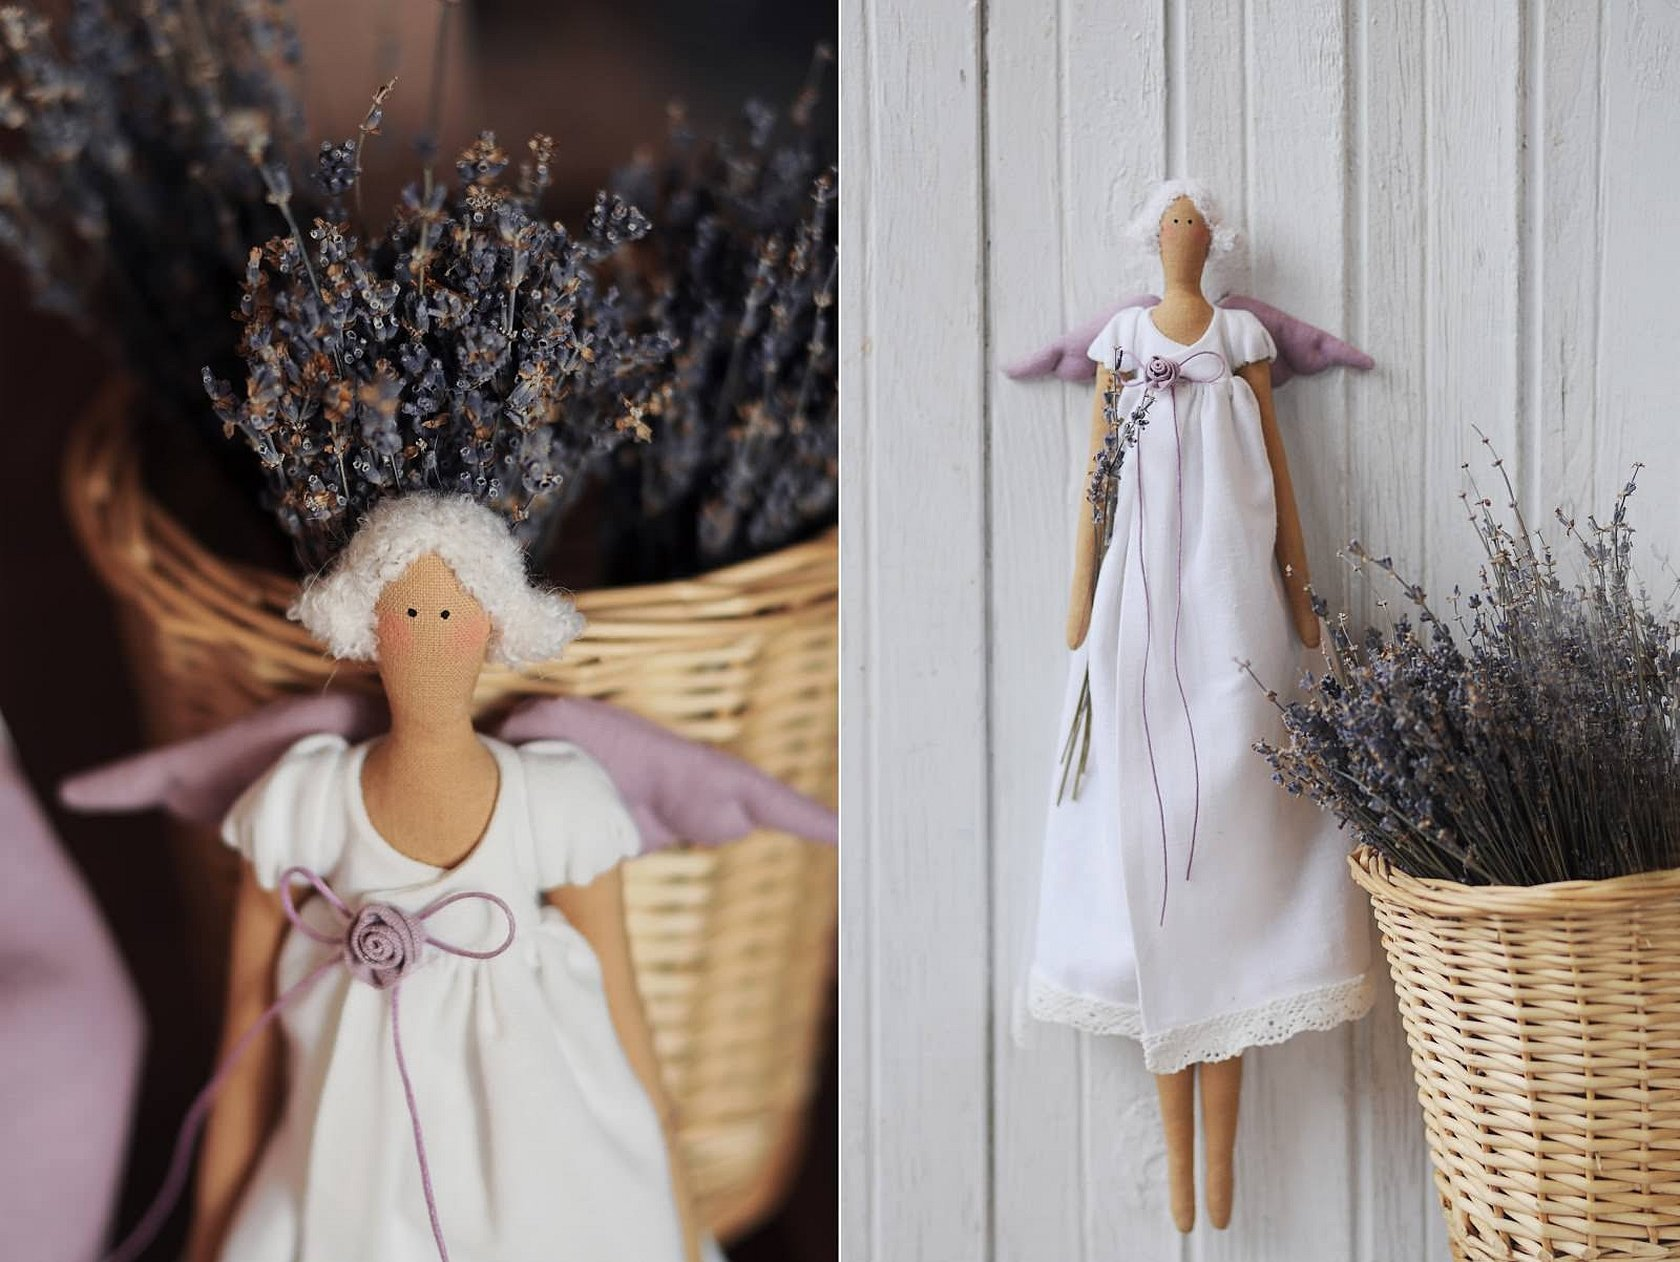 Кукла тильда лавандовый ангел